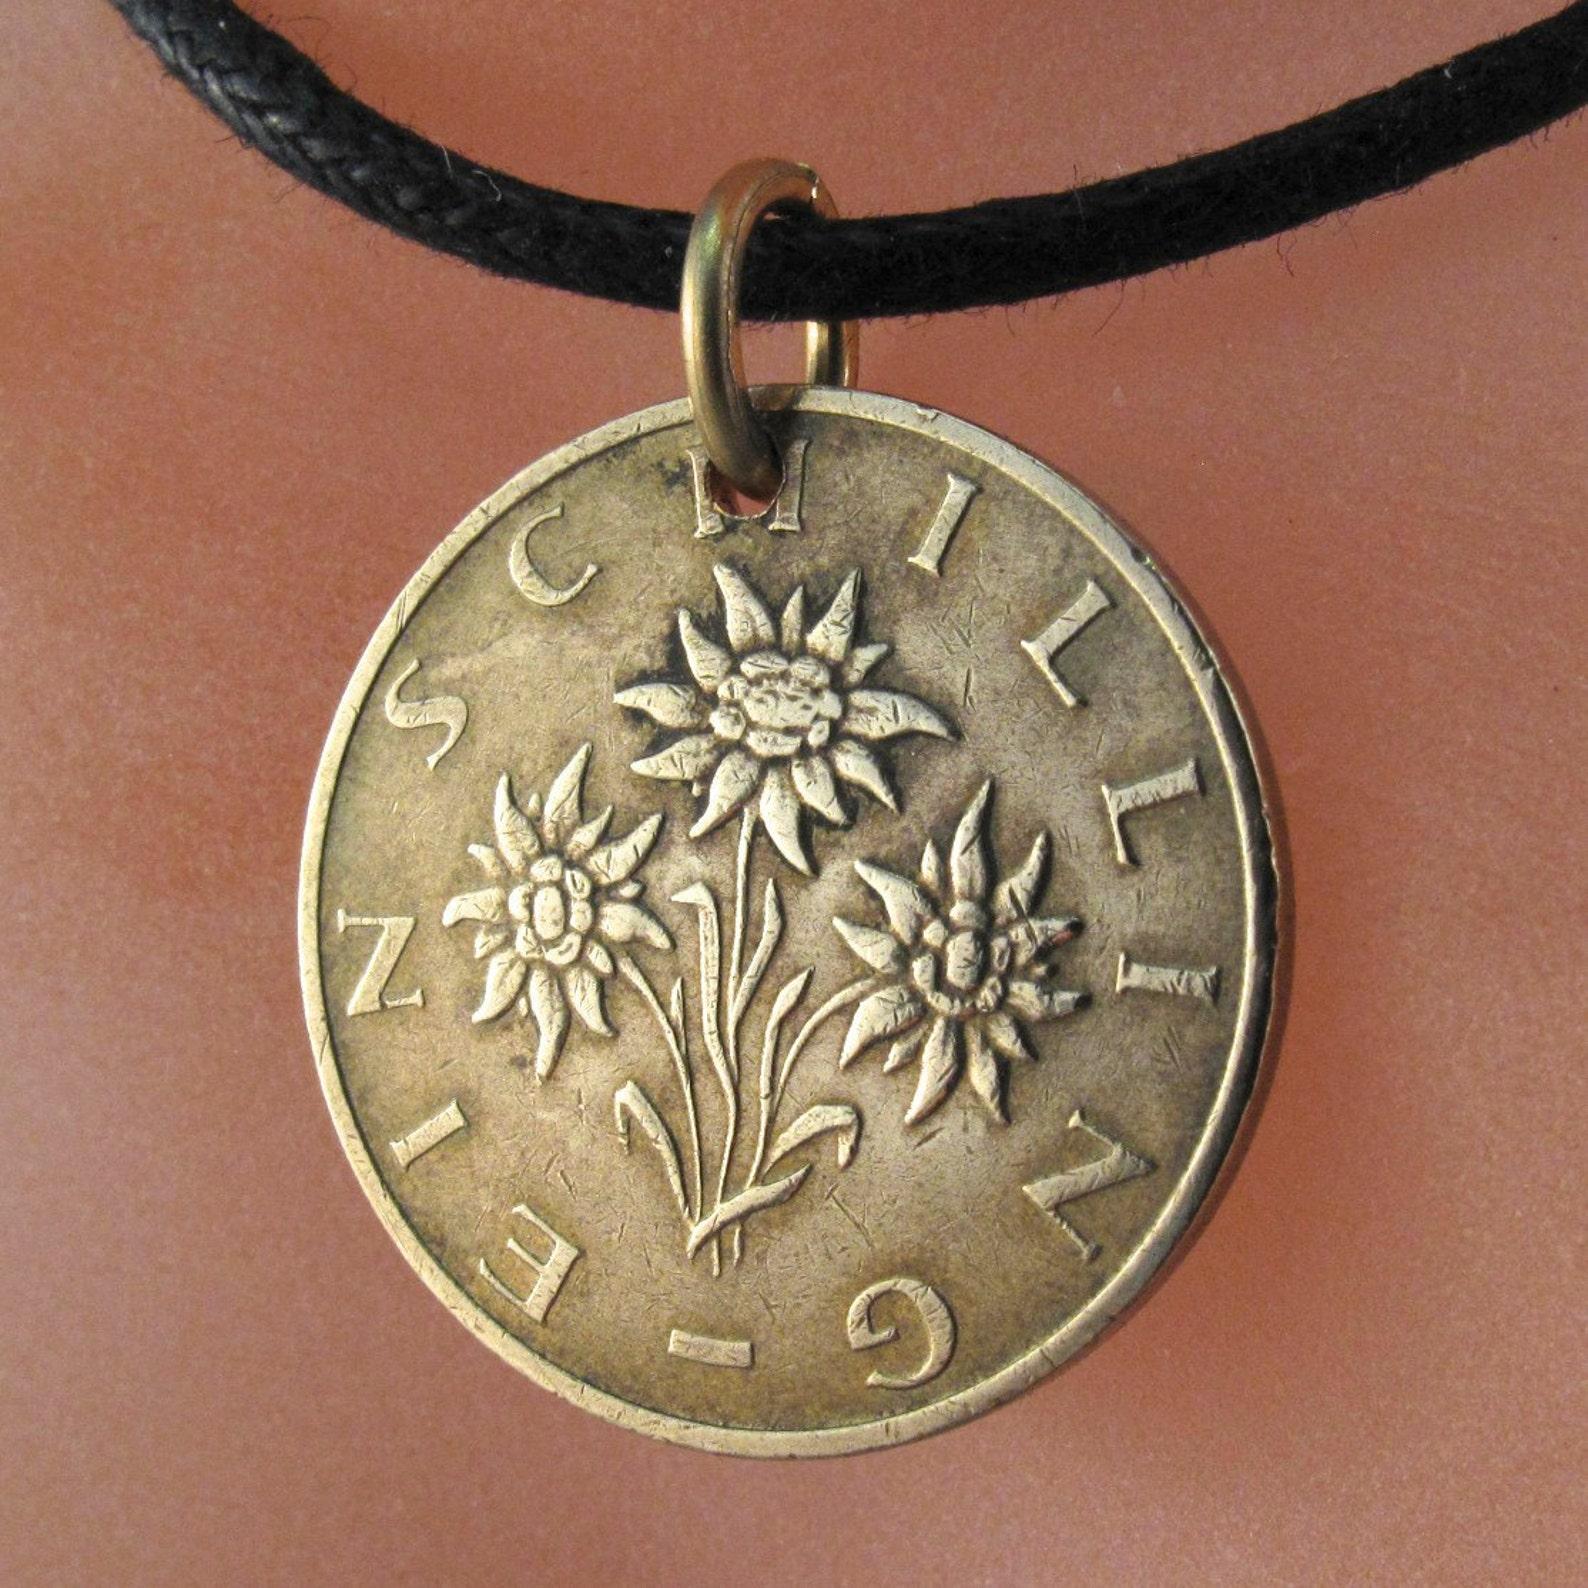 https://www.etsy.com/listing/121272866/austria-coin-necklace-pendant-charm